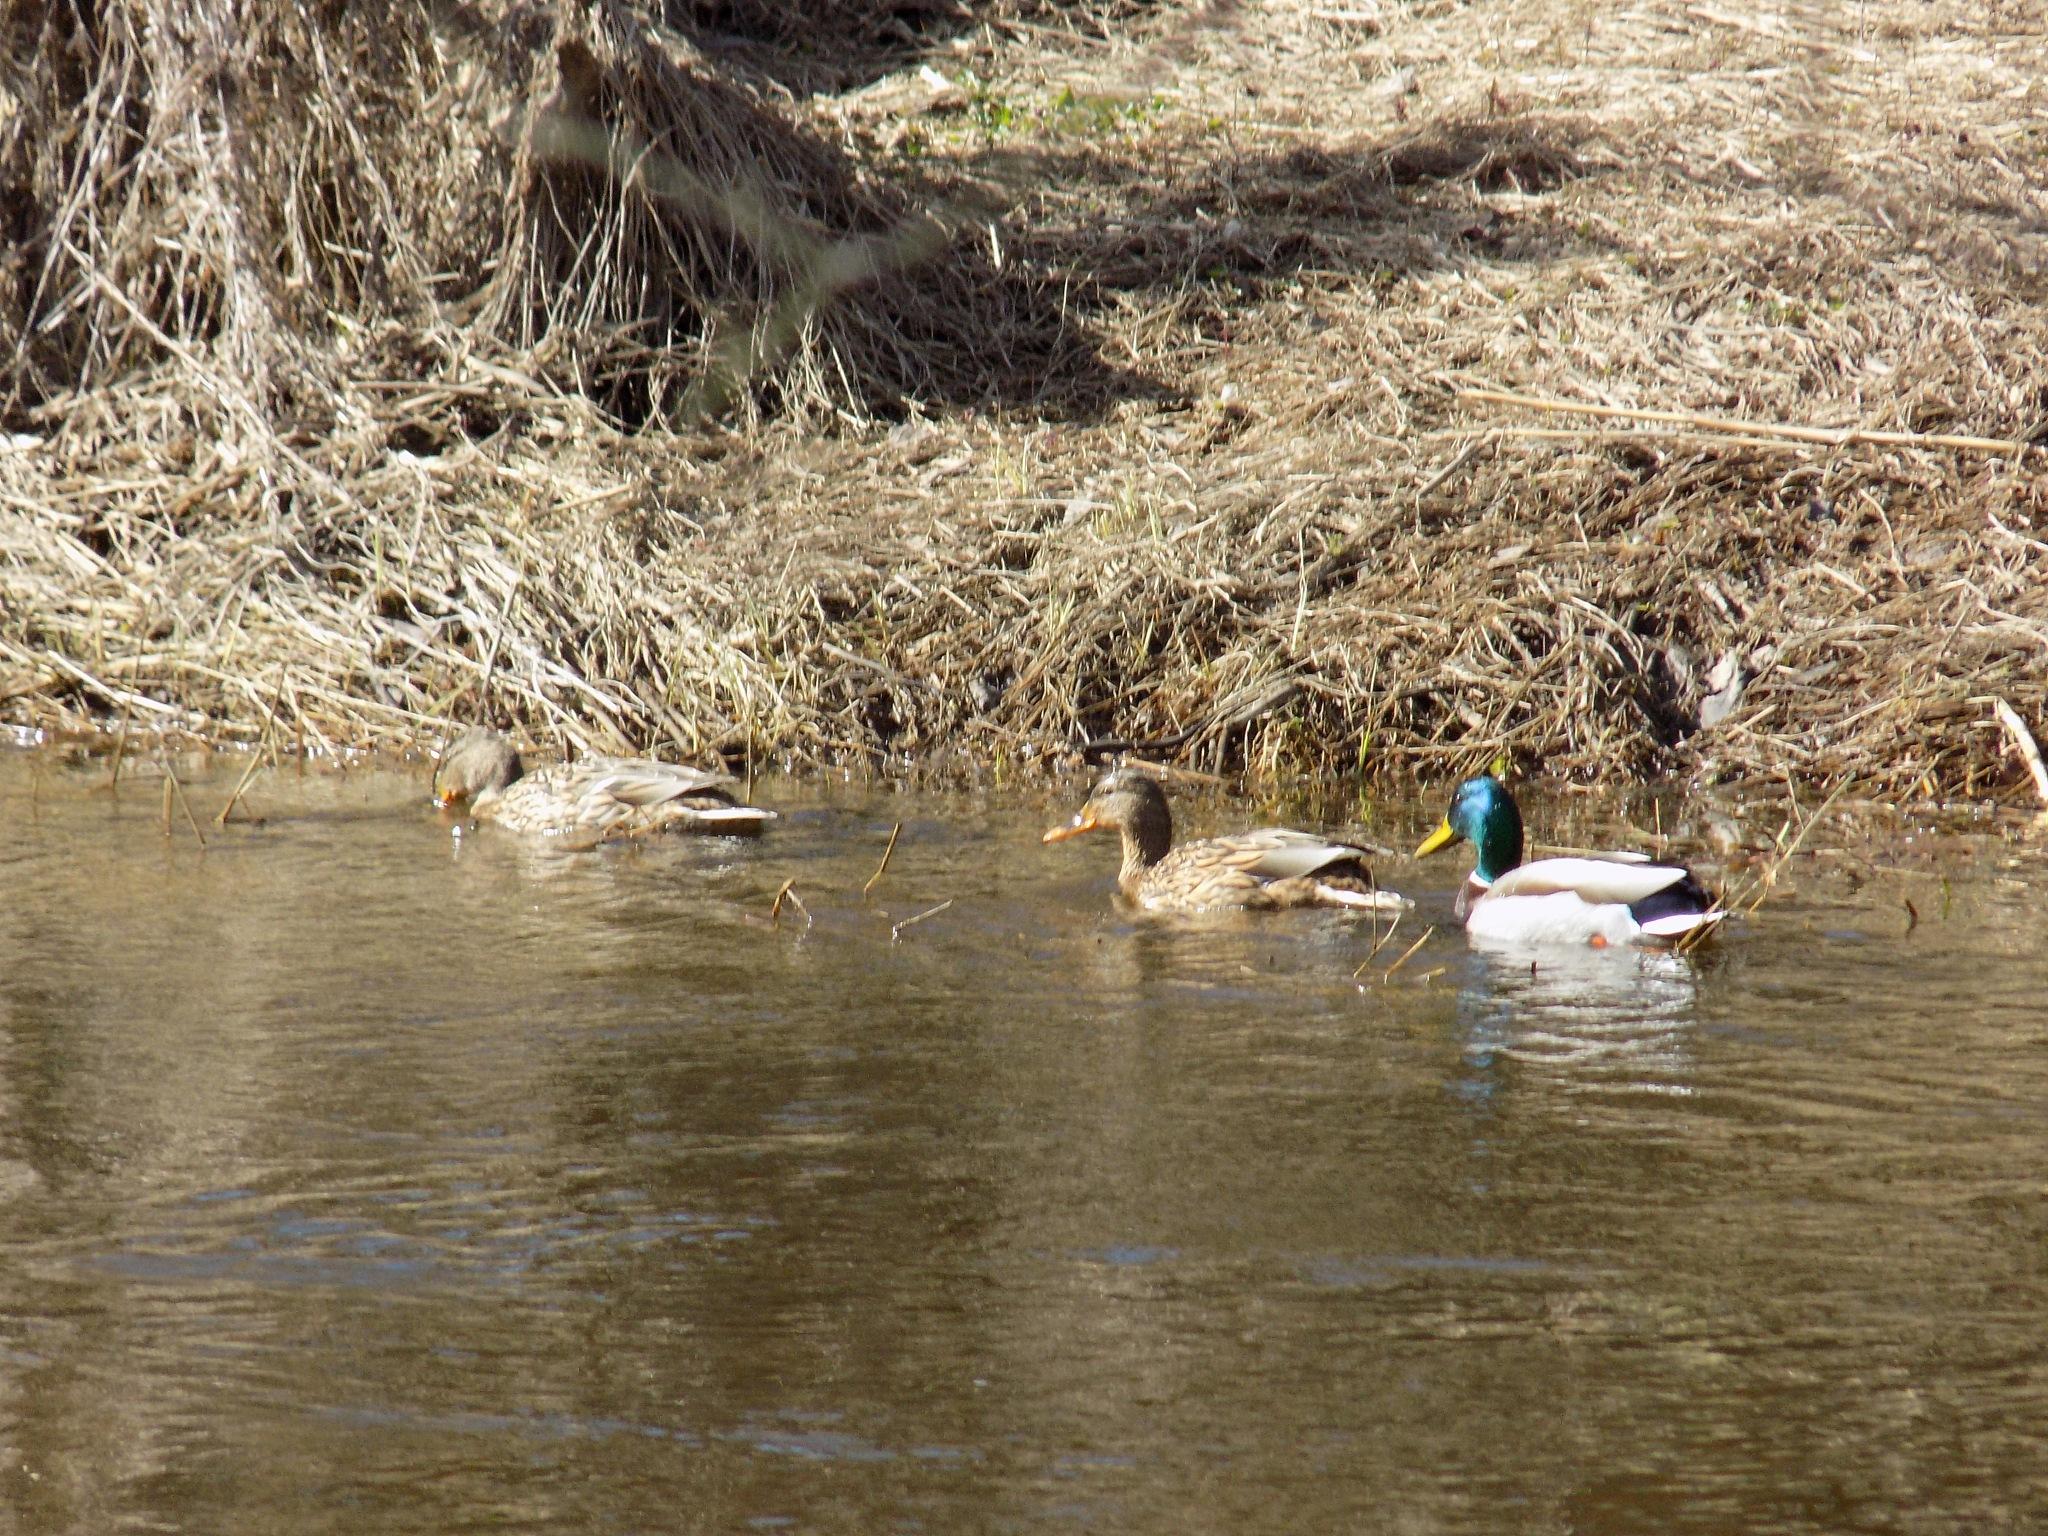 Ducks on the river by uzkuraitiene62